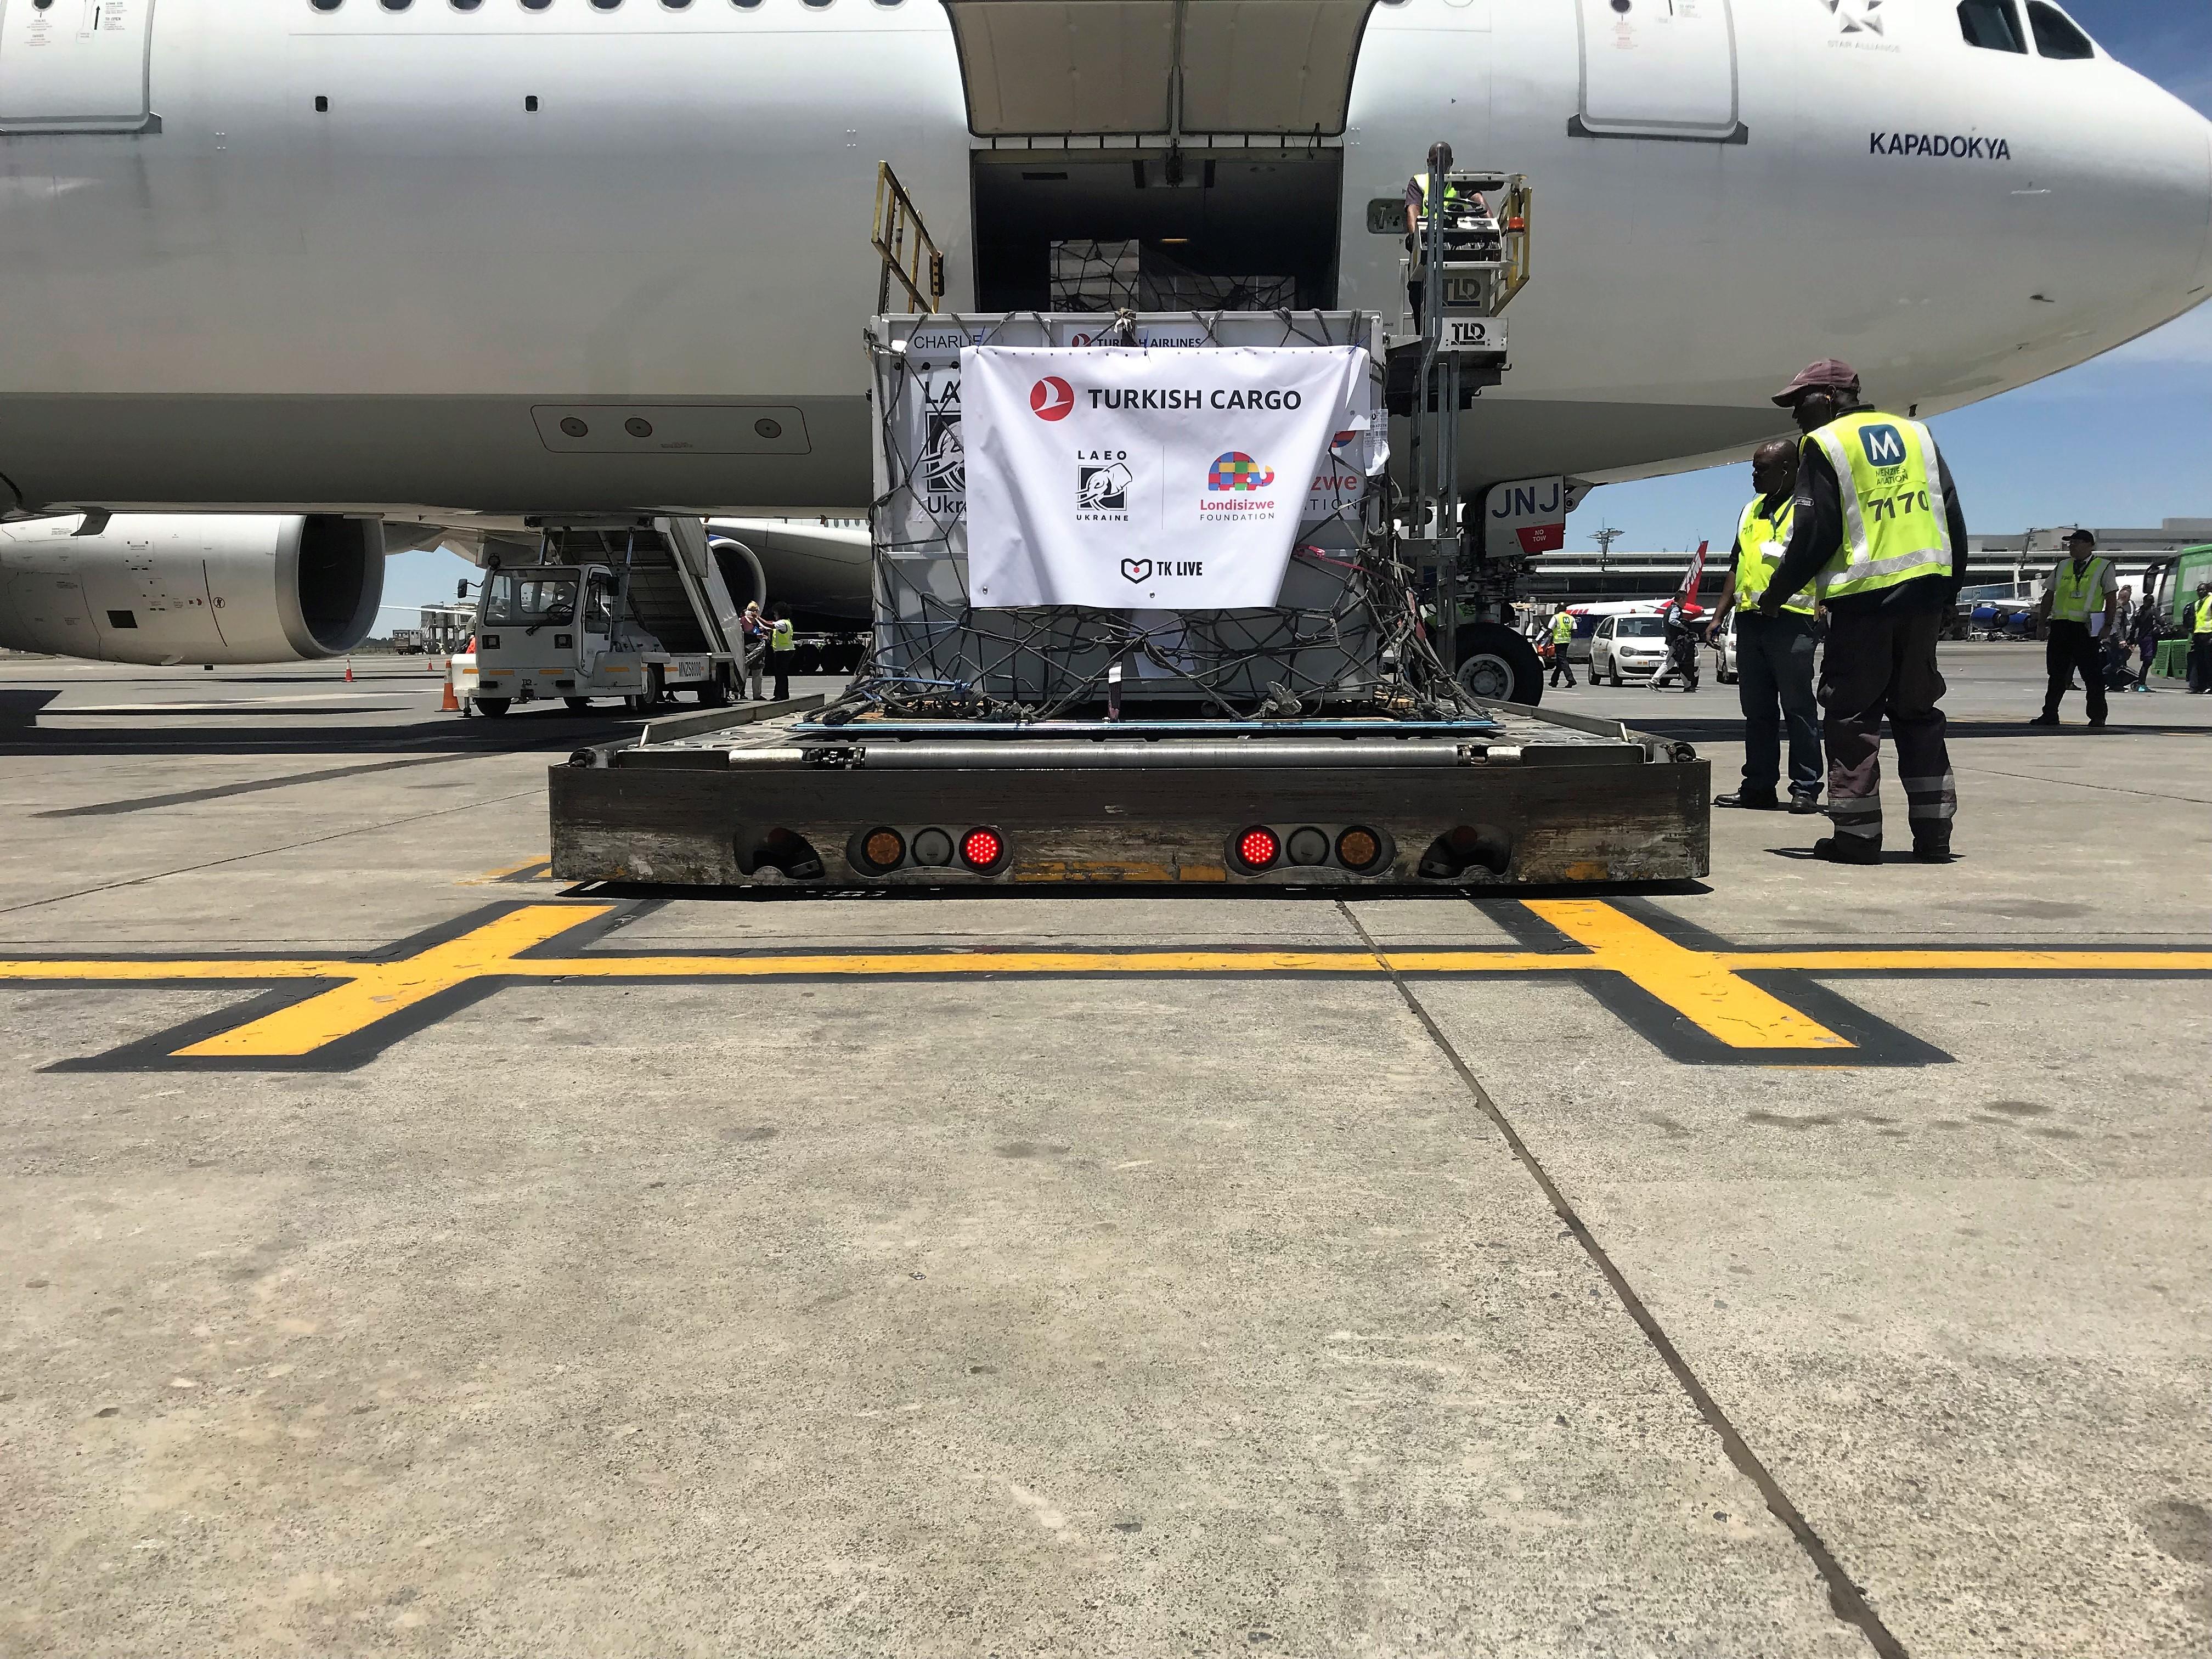 Turkish Cargo devuelve a tres leonas